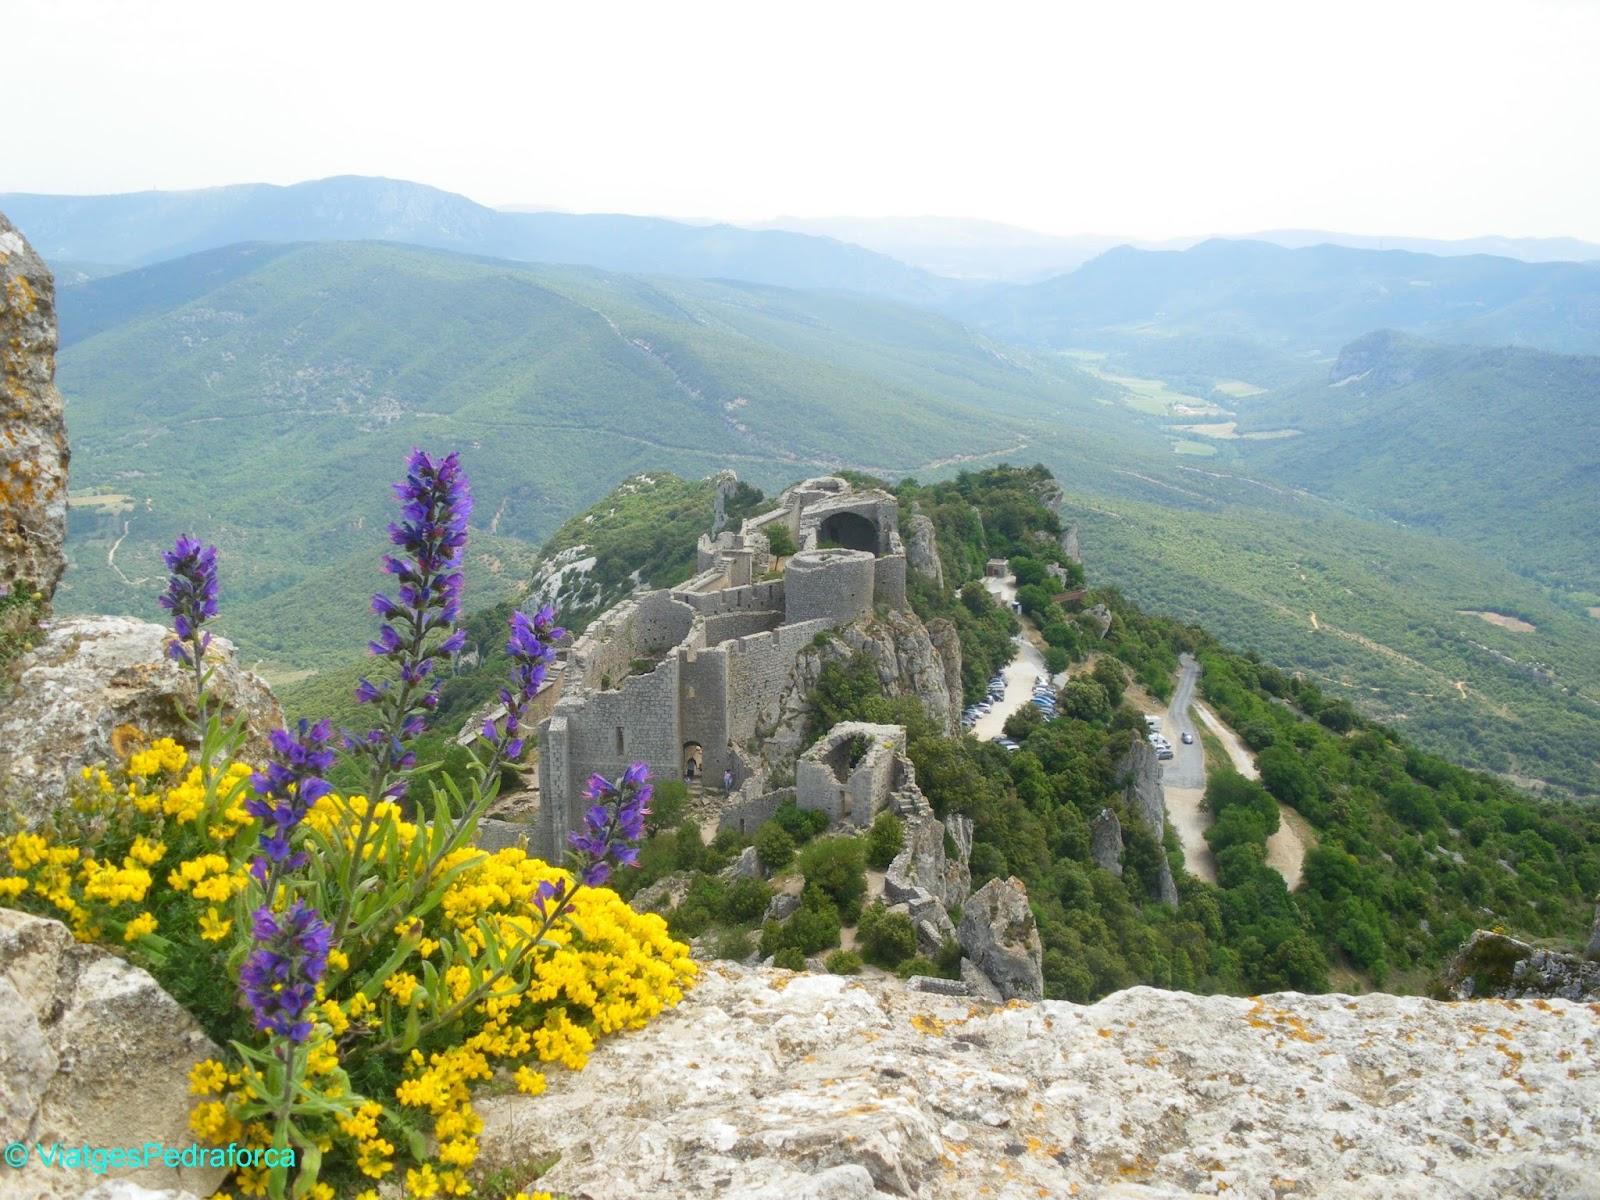 Castell càtar de Peyrepertuse, França, Aude, Pays Cathare, País Càtar, Art romànic